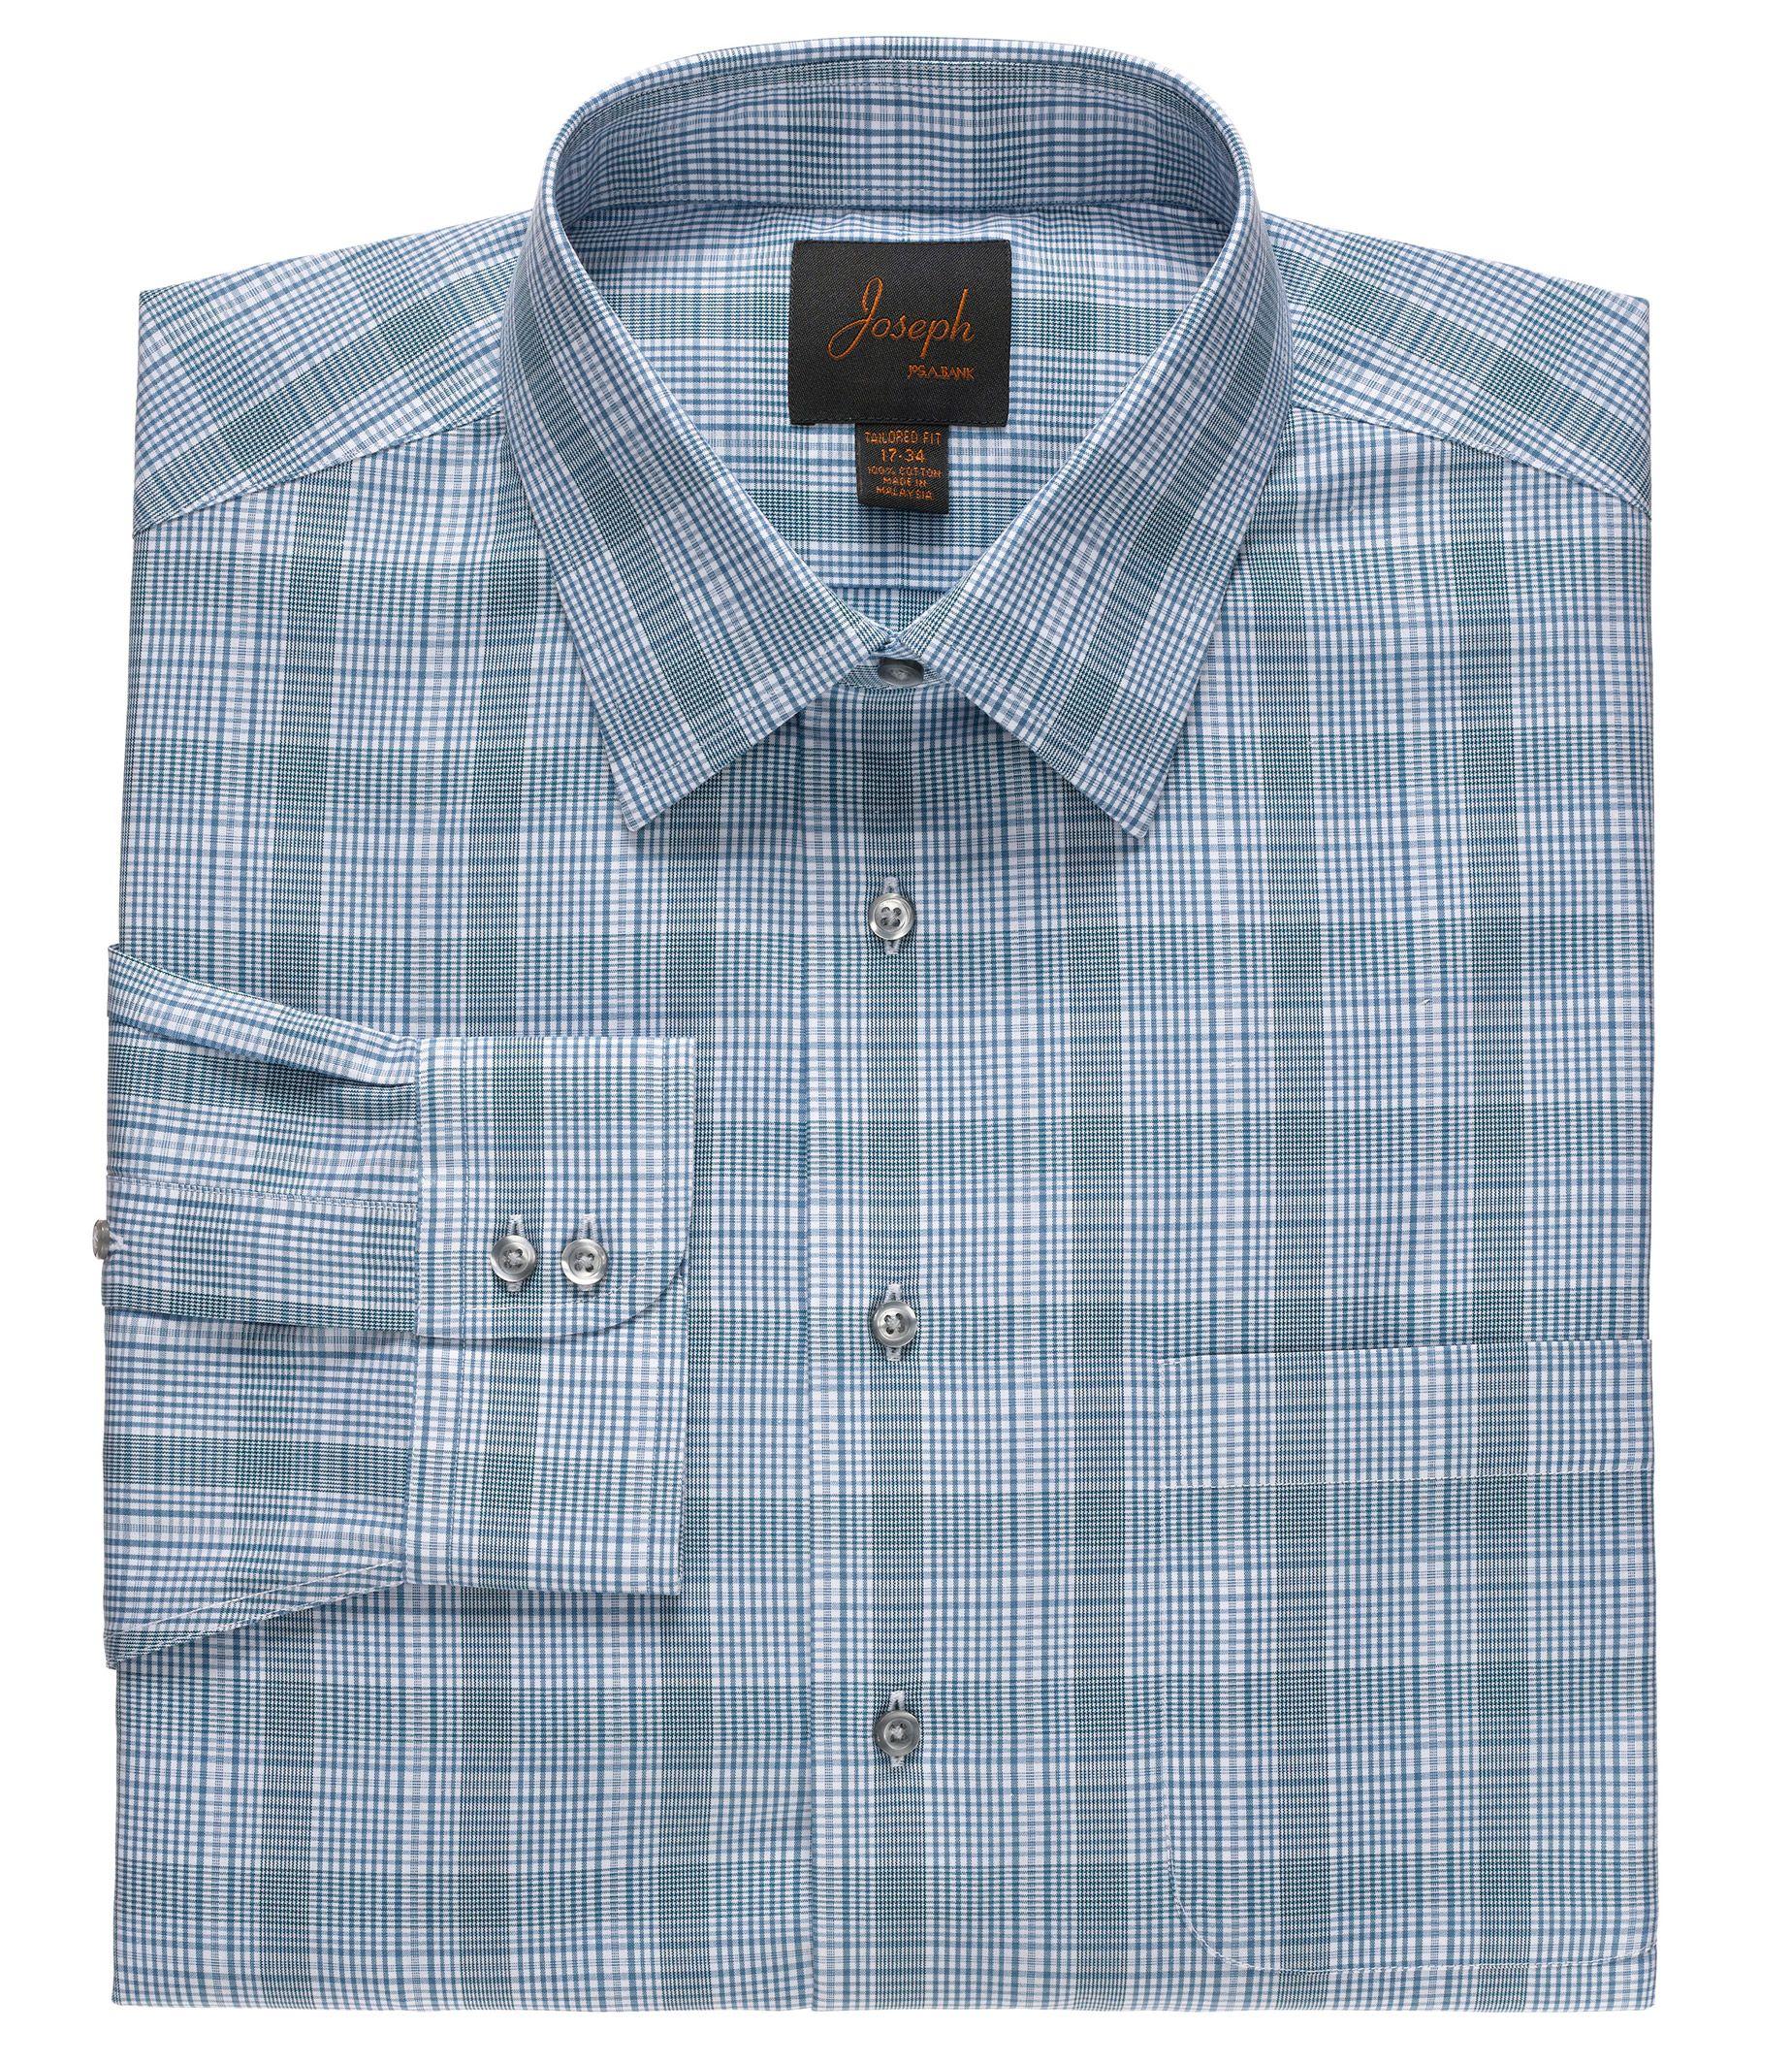 Joseph Spread Collar Cotton Plaid Dress Shir      t